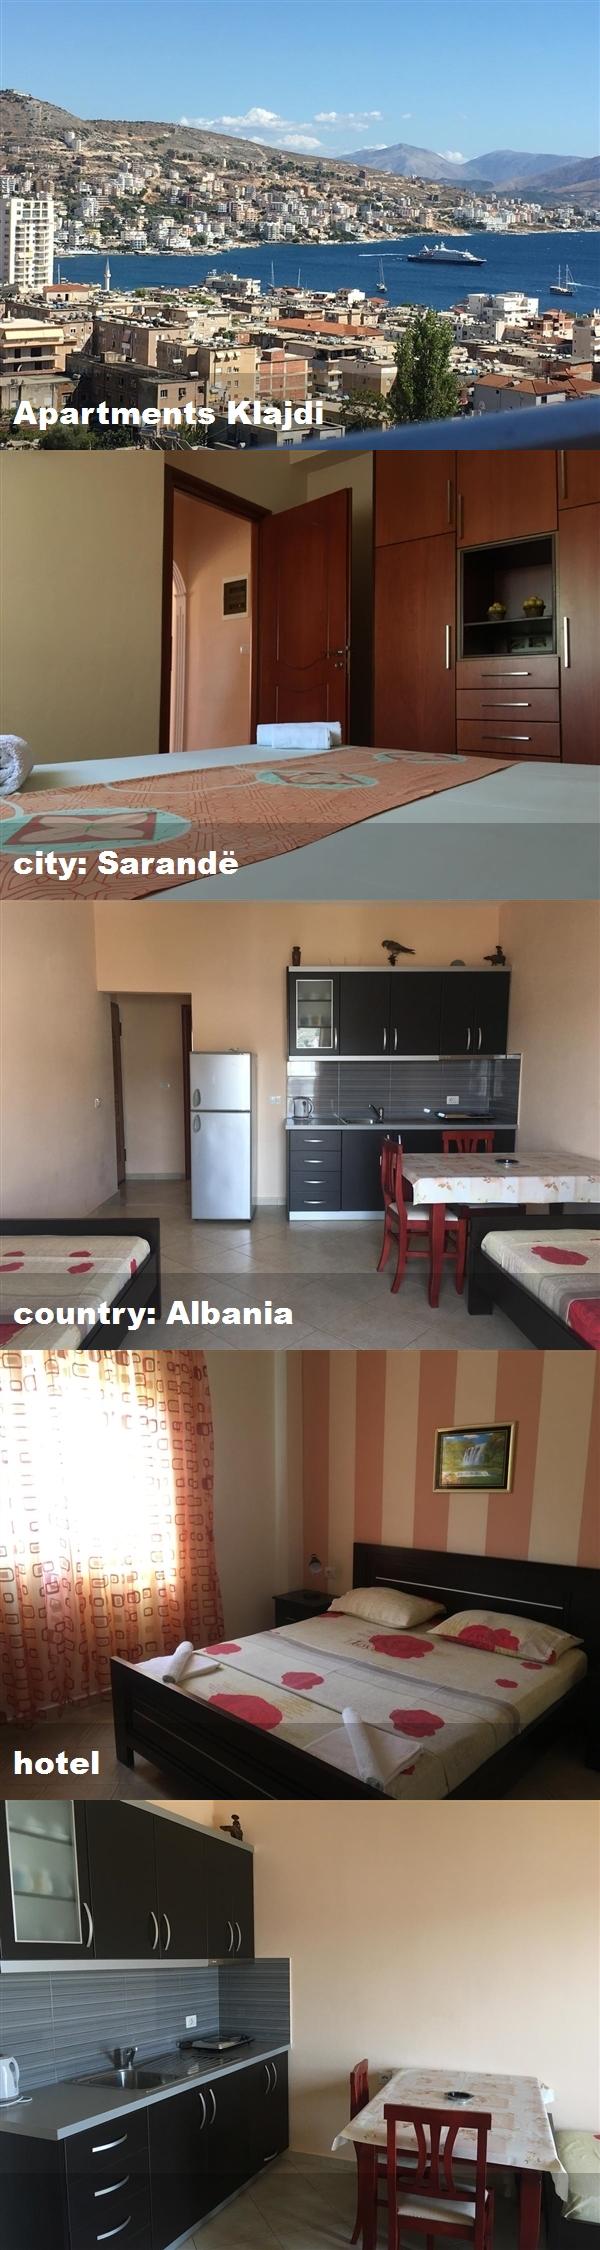 Apartments Klajdi, city Sarandë, country Albania, hotel